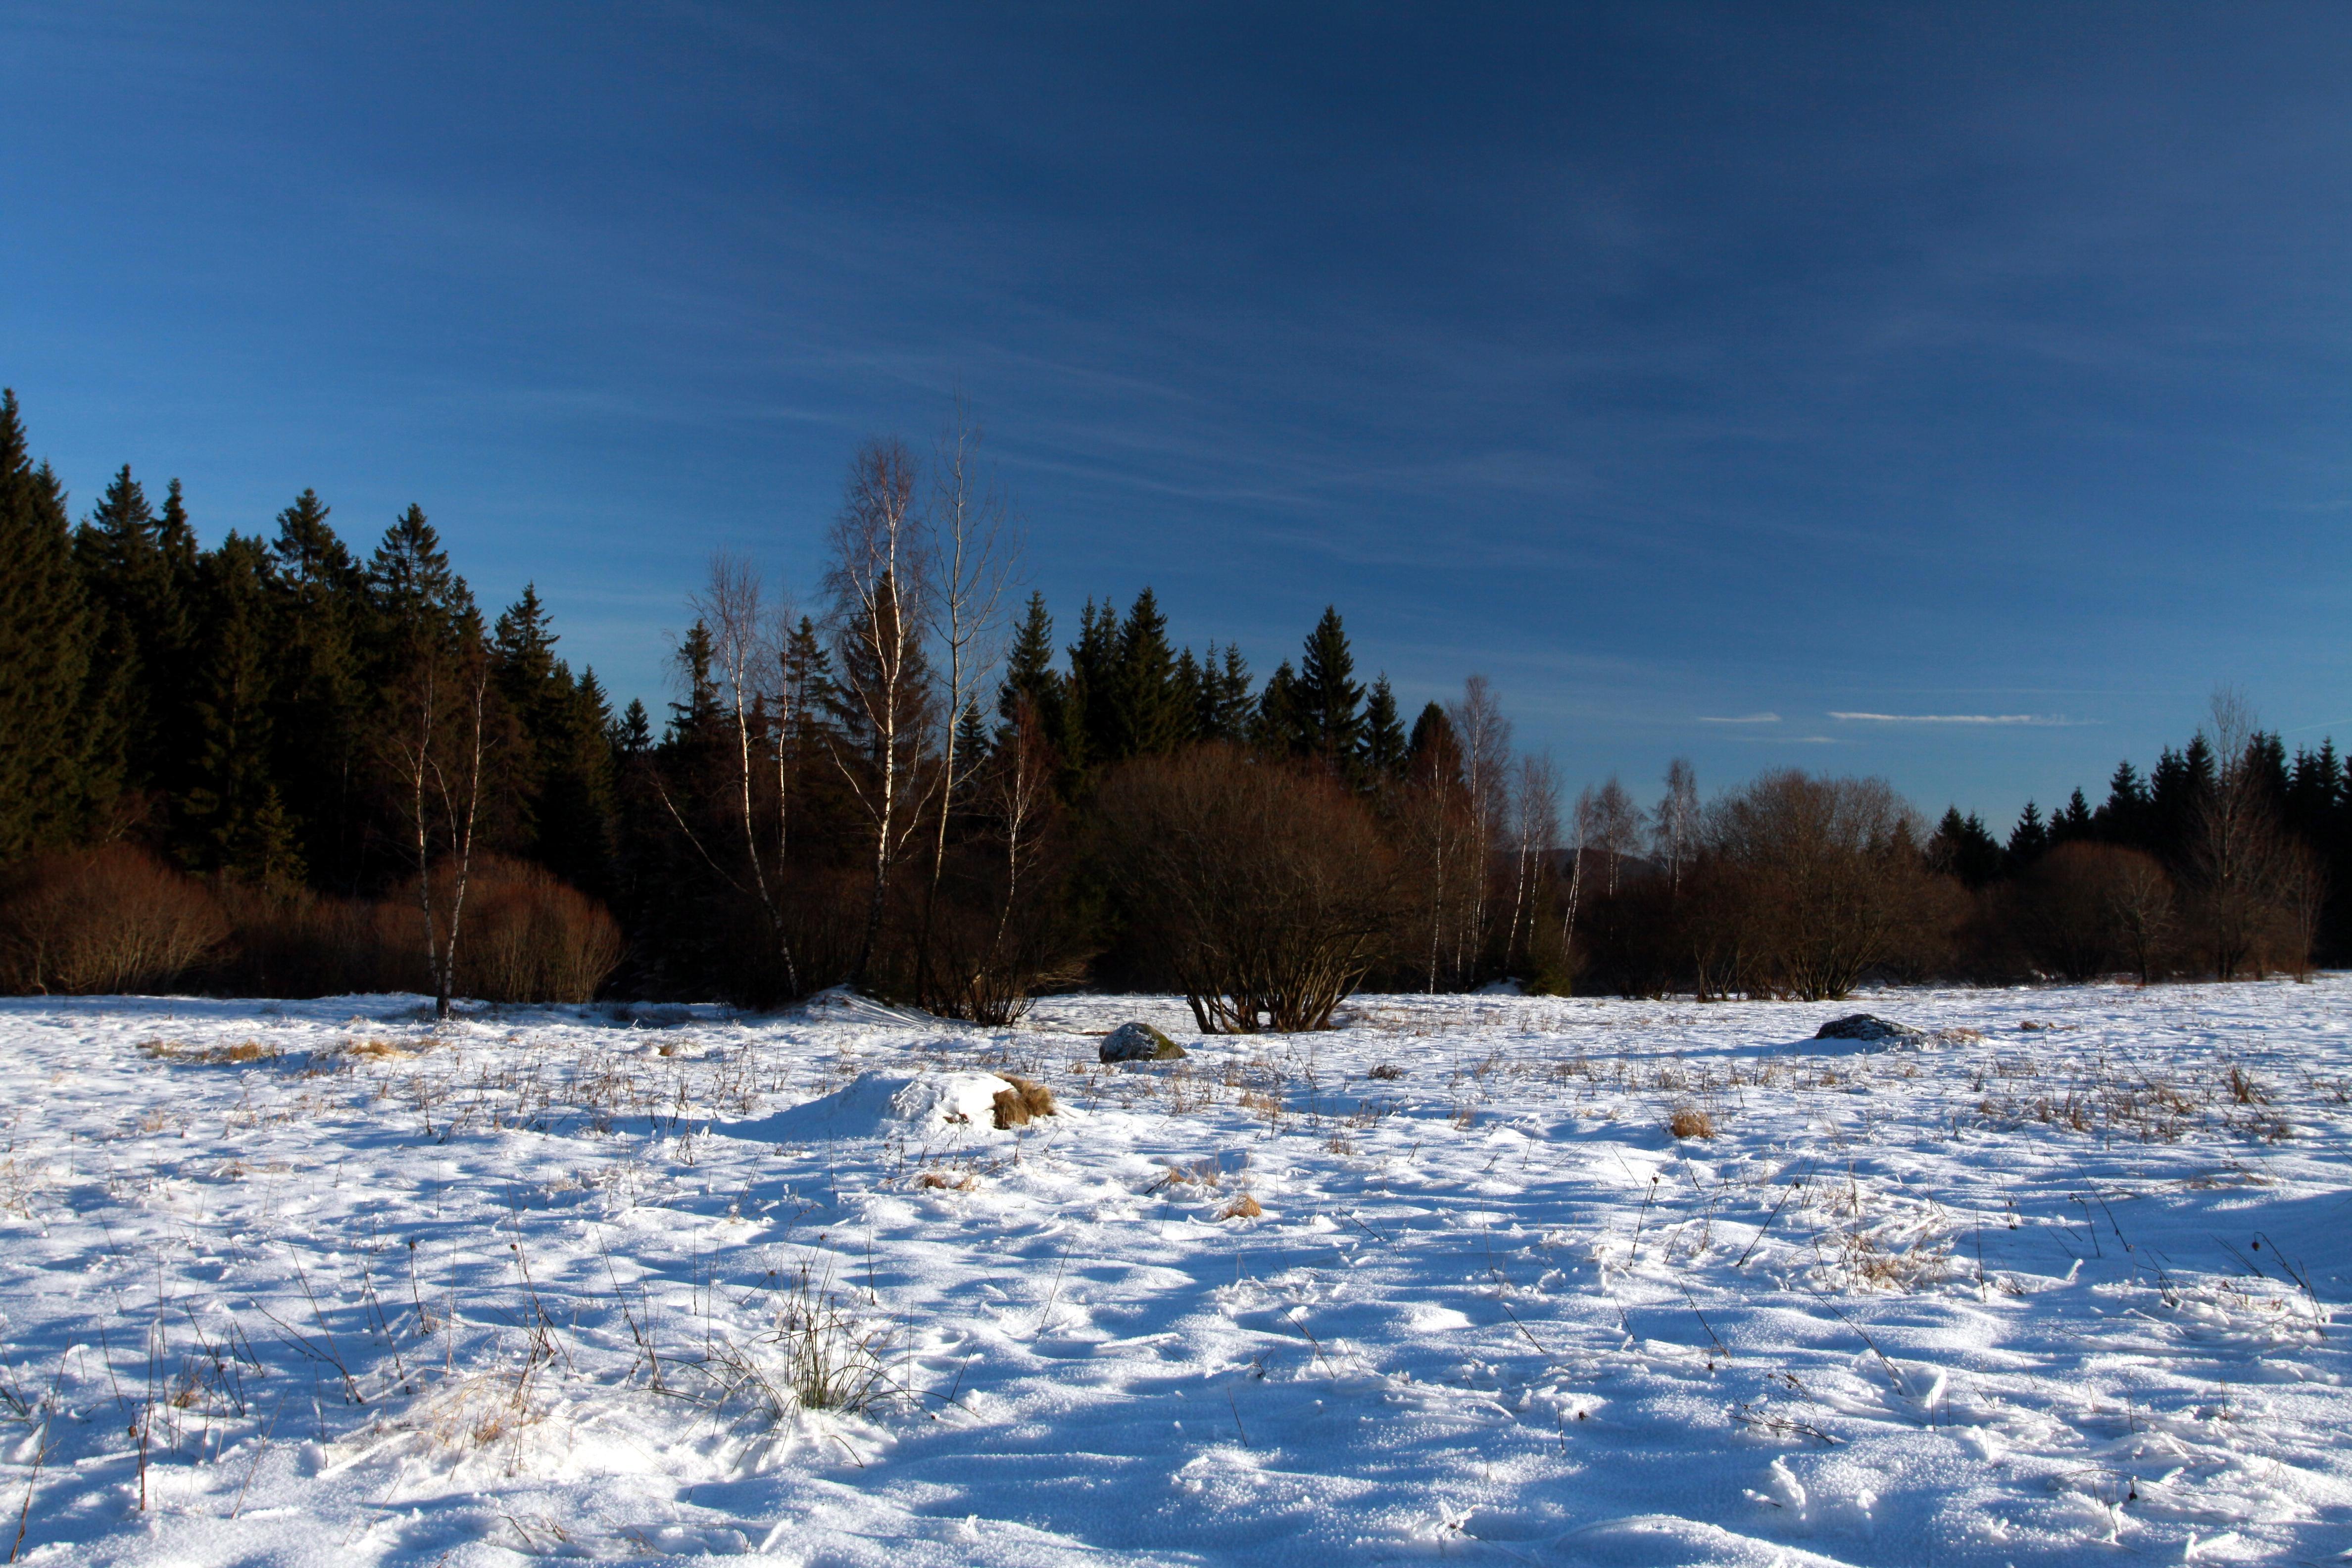 Winter V Natural Resources Defense Council Quimbee